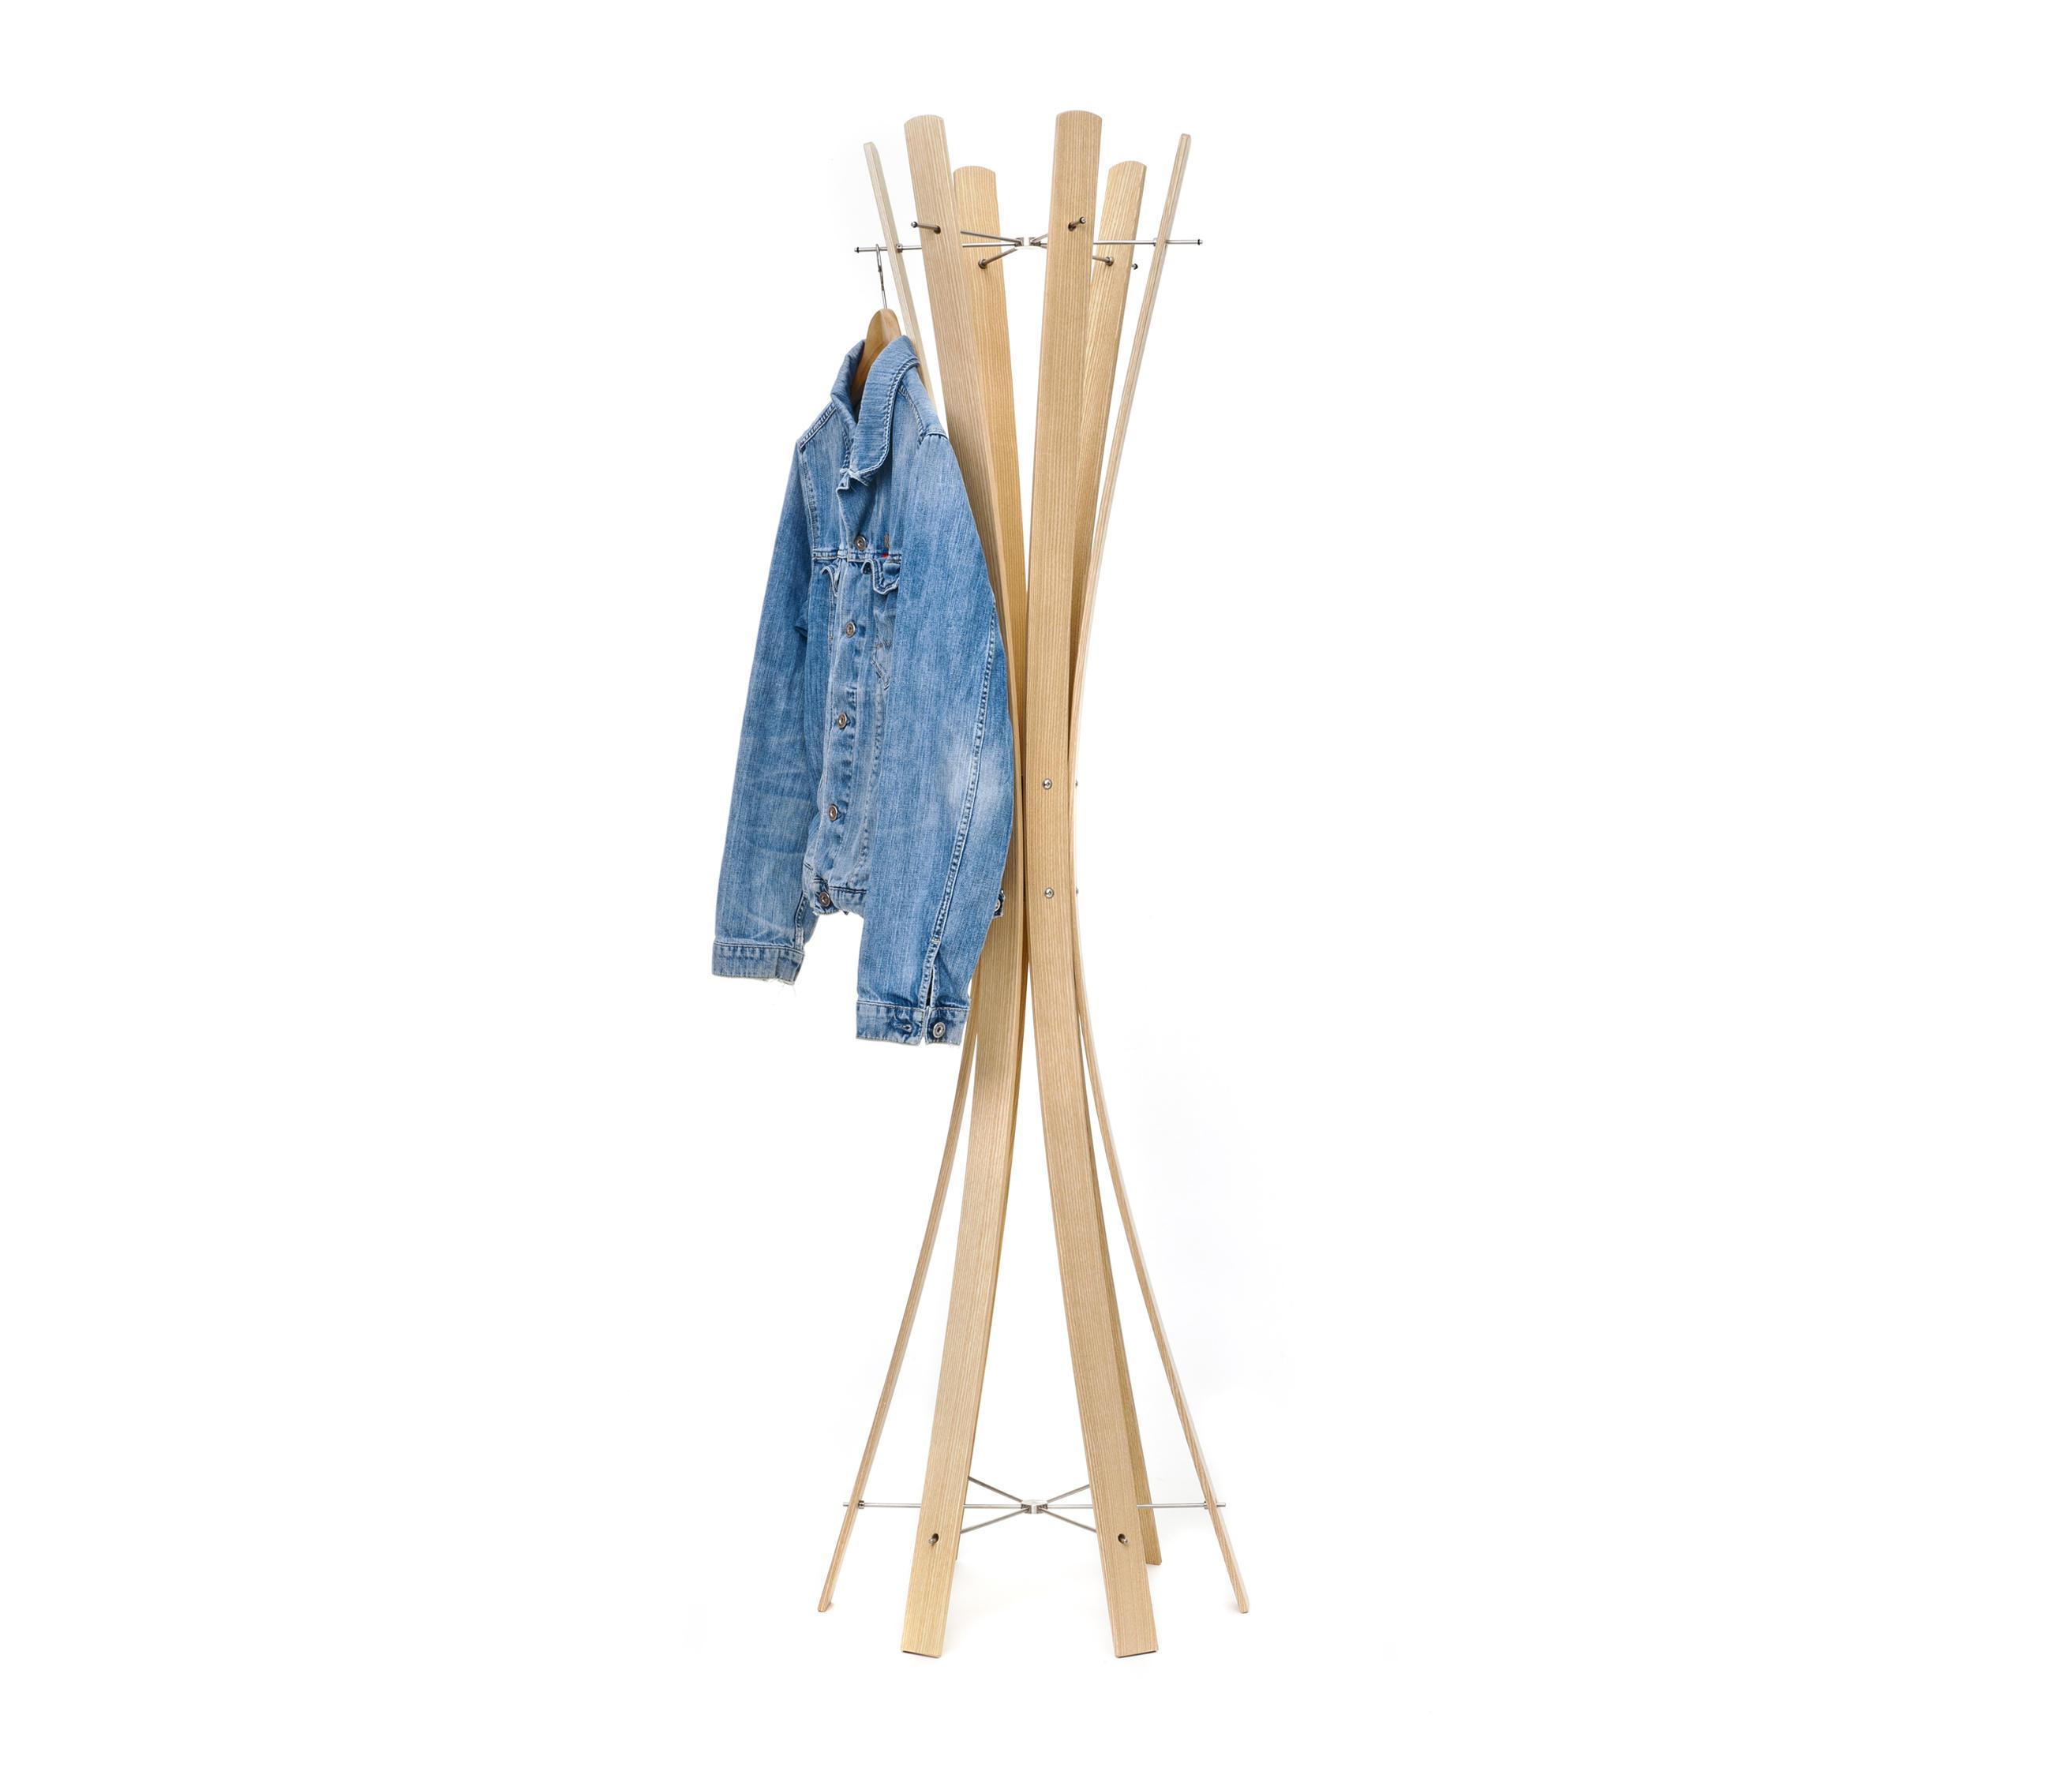 Naomiash Coat Rack Racks From Keilbach Architonic Naomi By